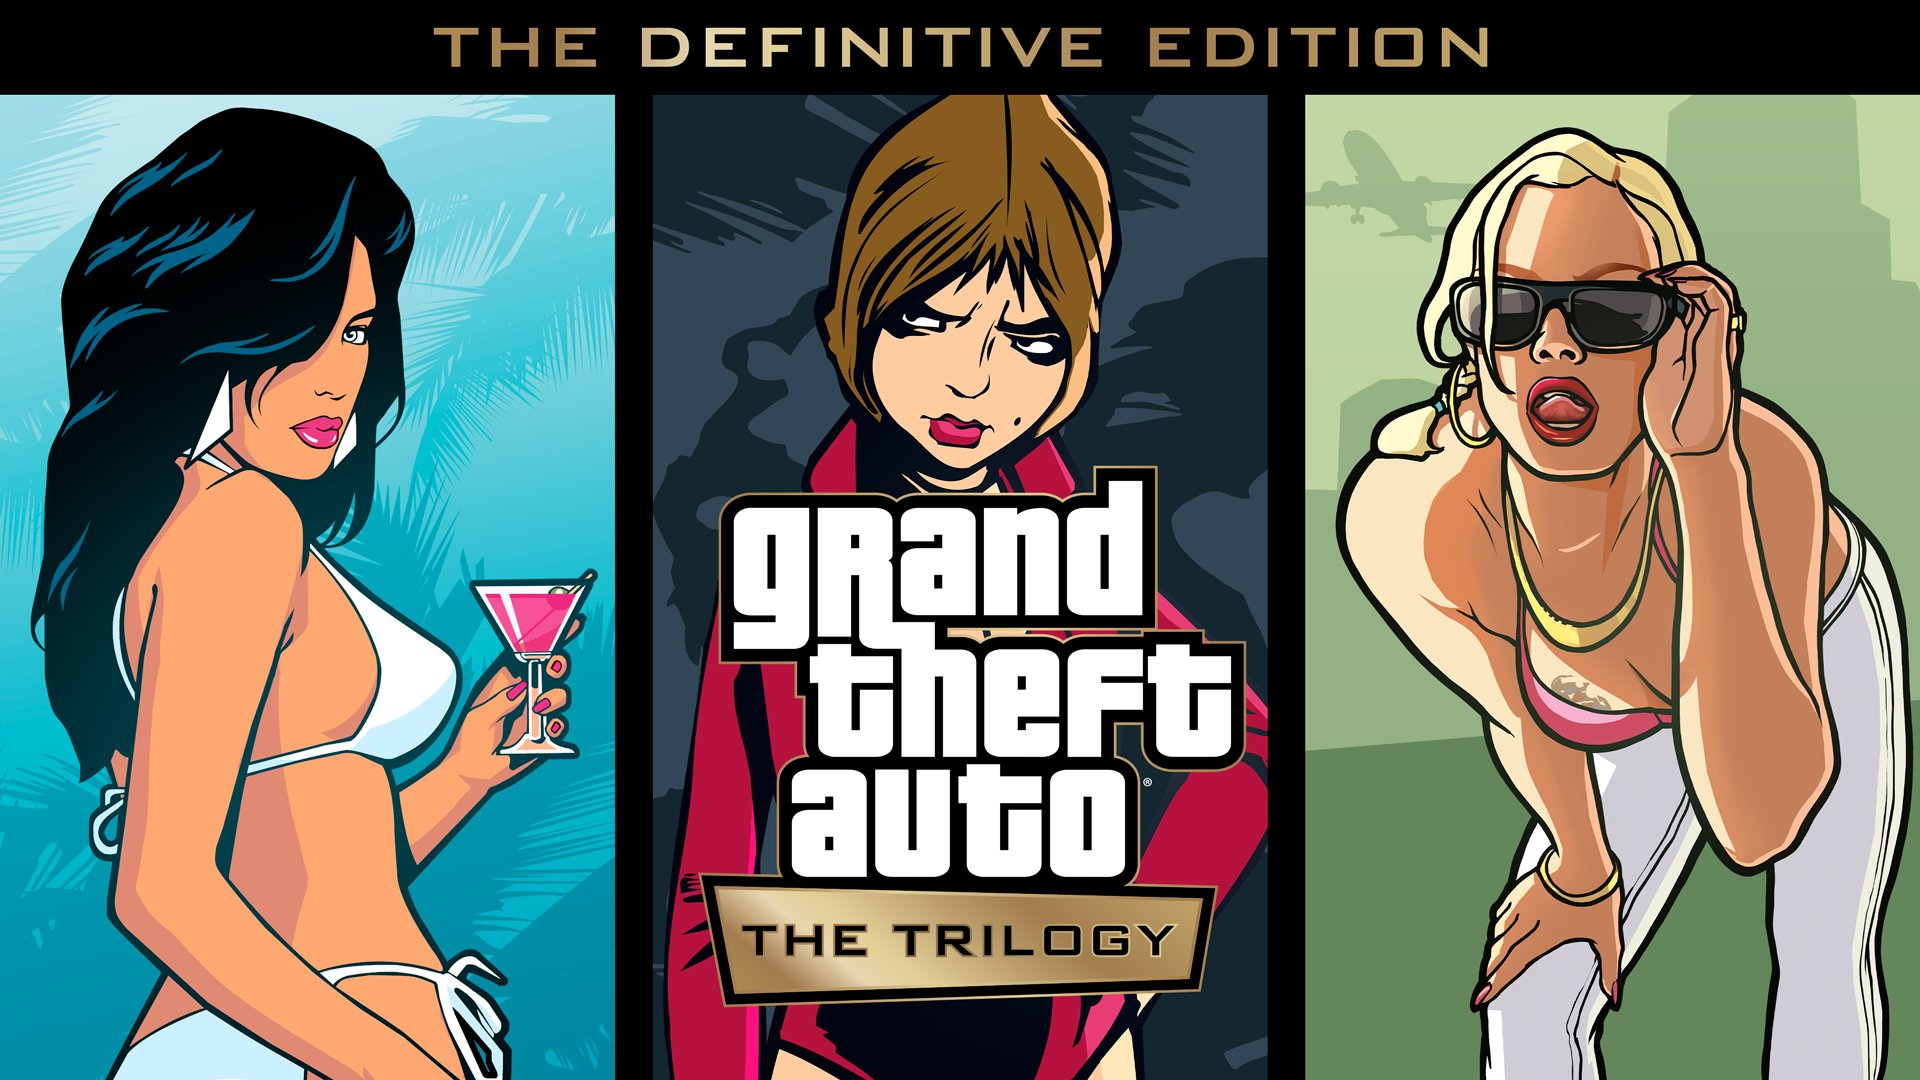 Официально: трилогия переизданий Grand Theft Auto анонсирована